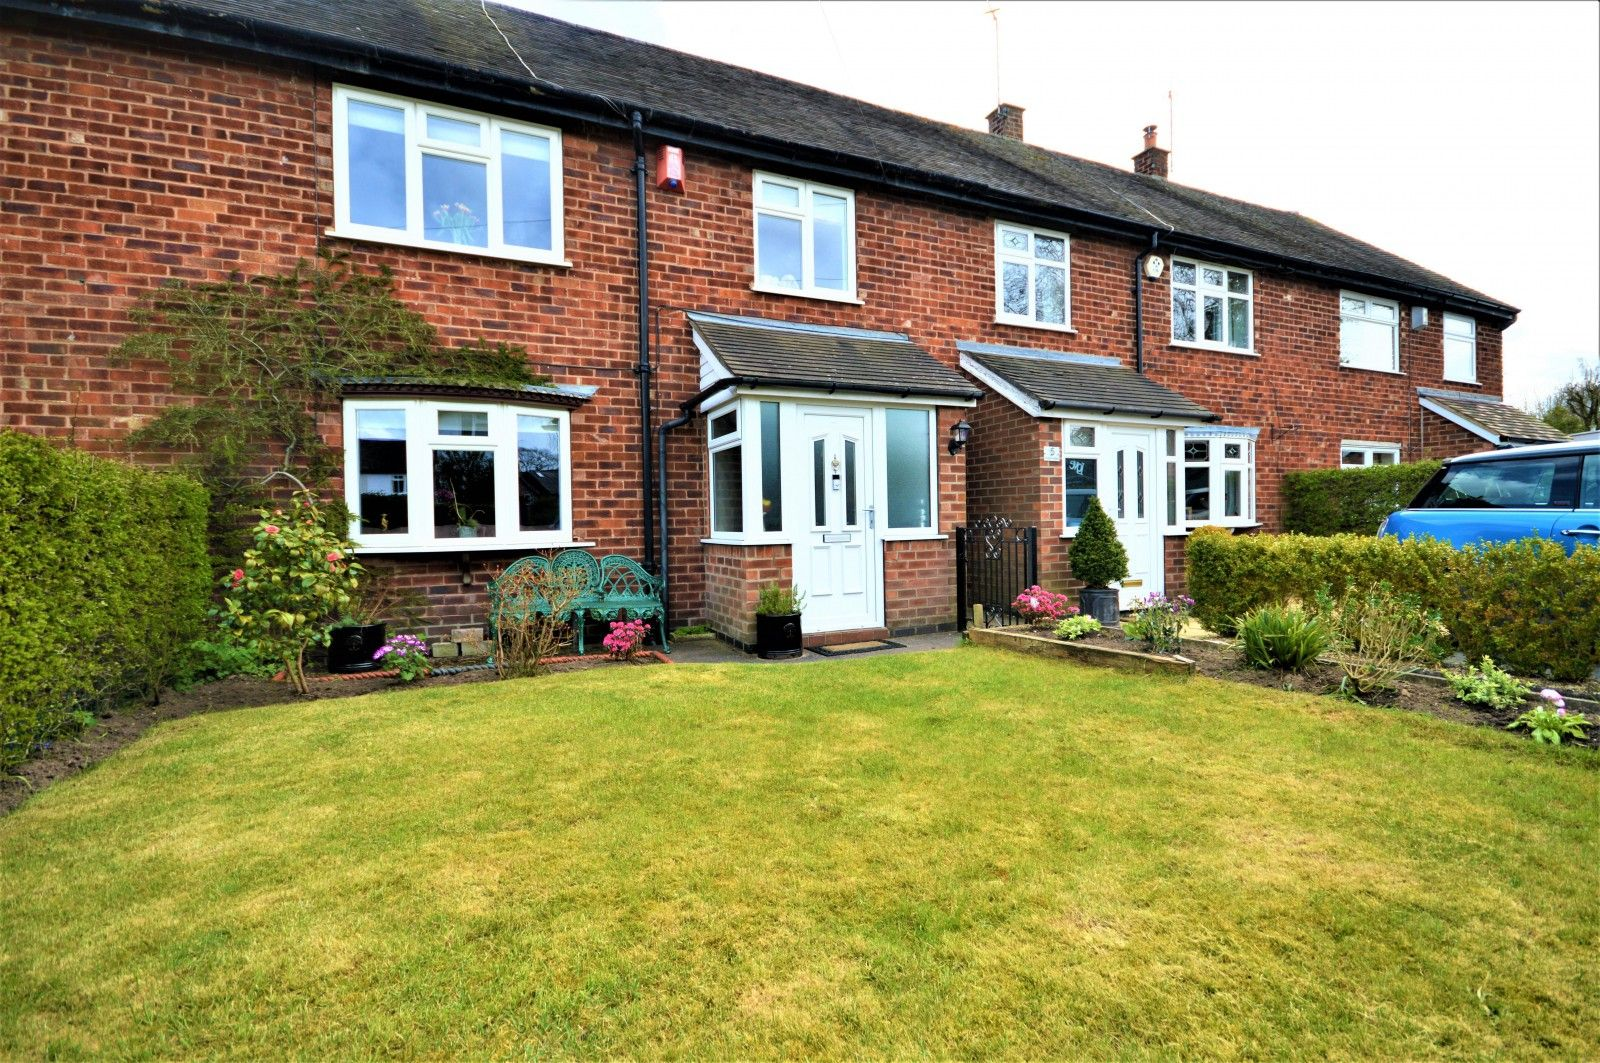 Property photo 1 of 15. Main Front Image (Main)